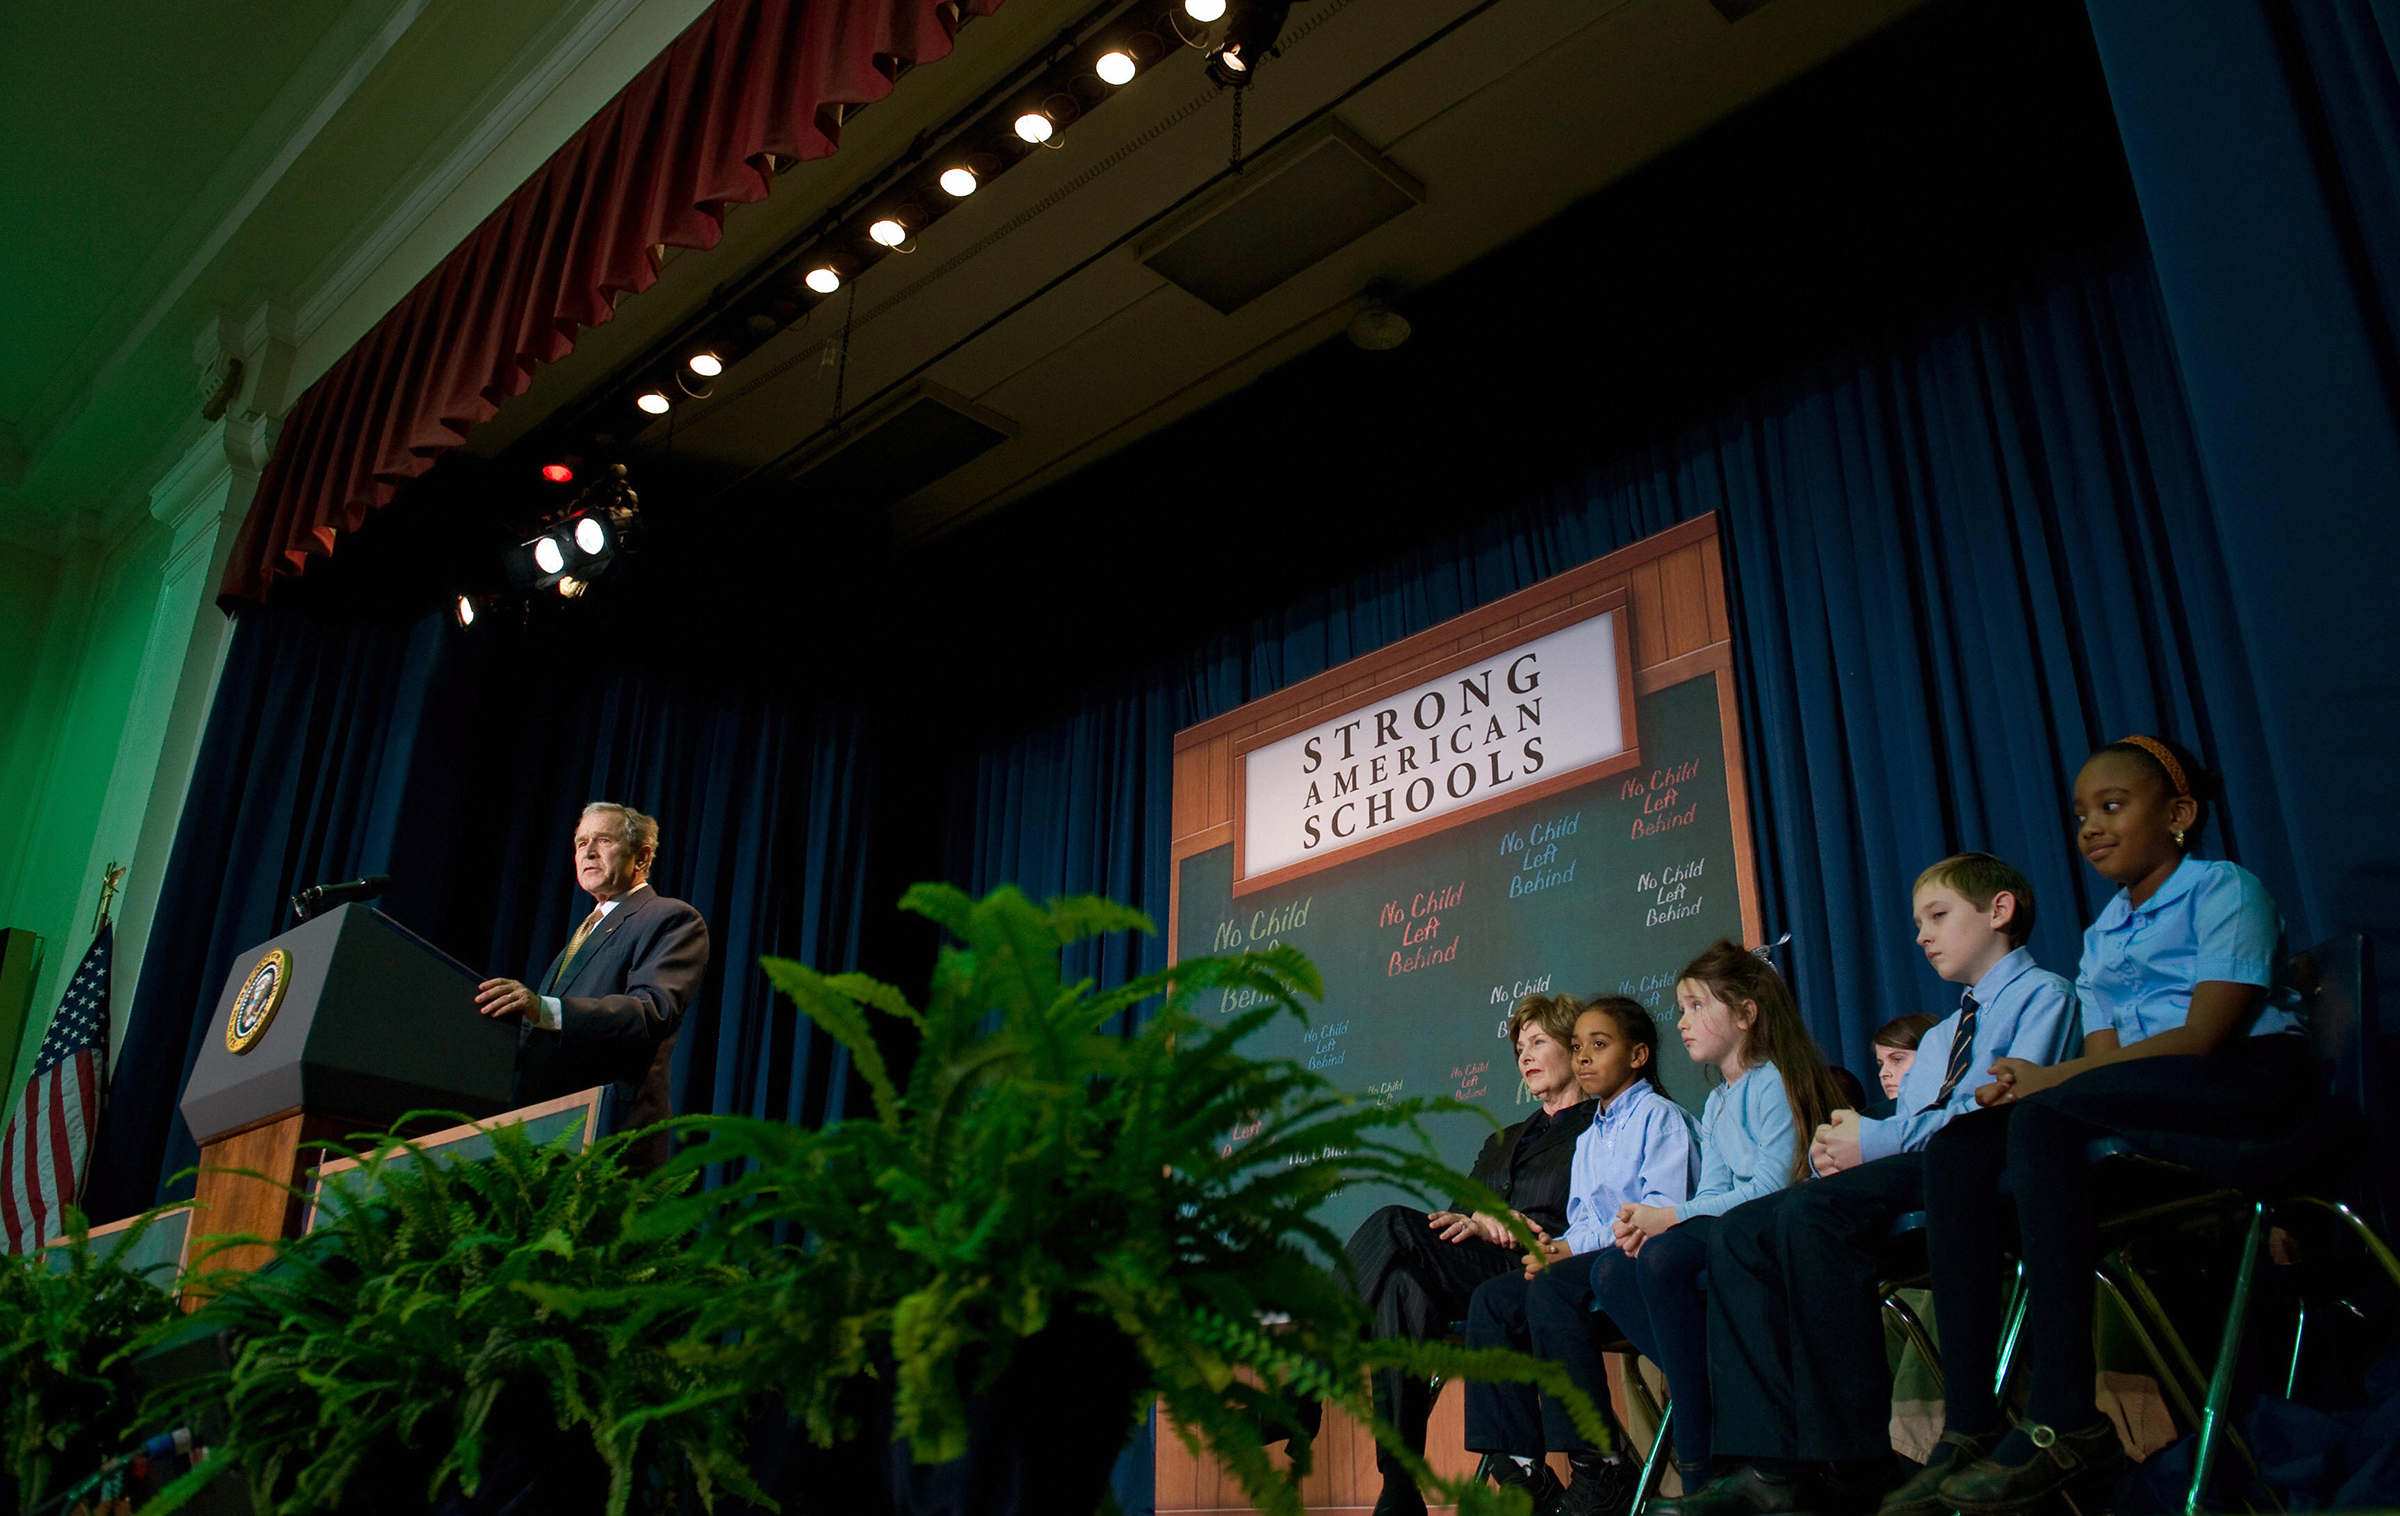 Former US President George W. Bush speaks on No Child Left Behind at General Philip Kearny School in Philadelphia, Pennsylvania, on Jan. 8, 2009.